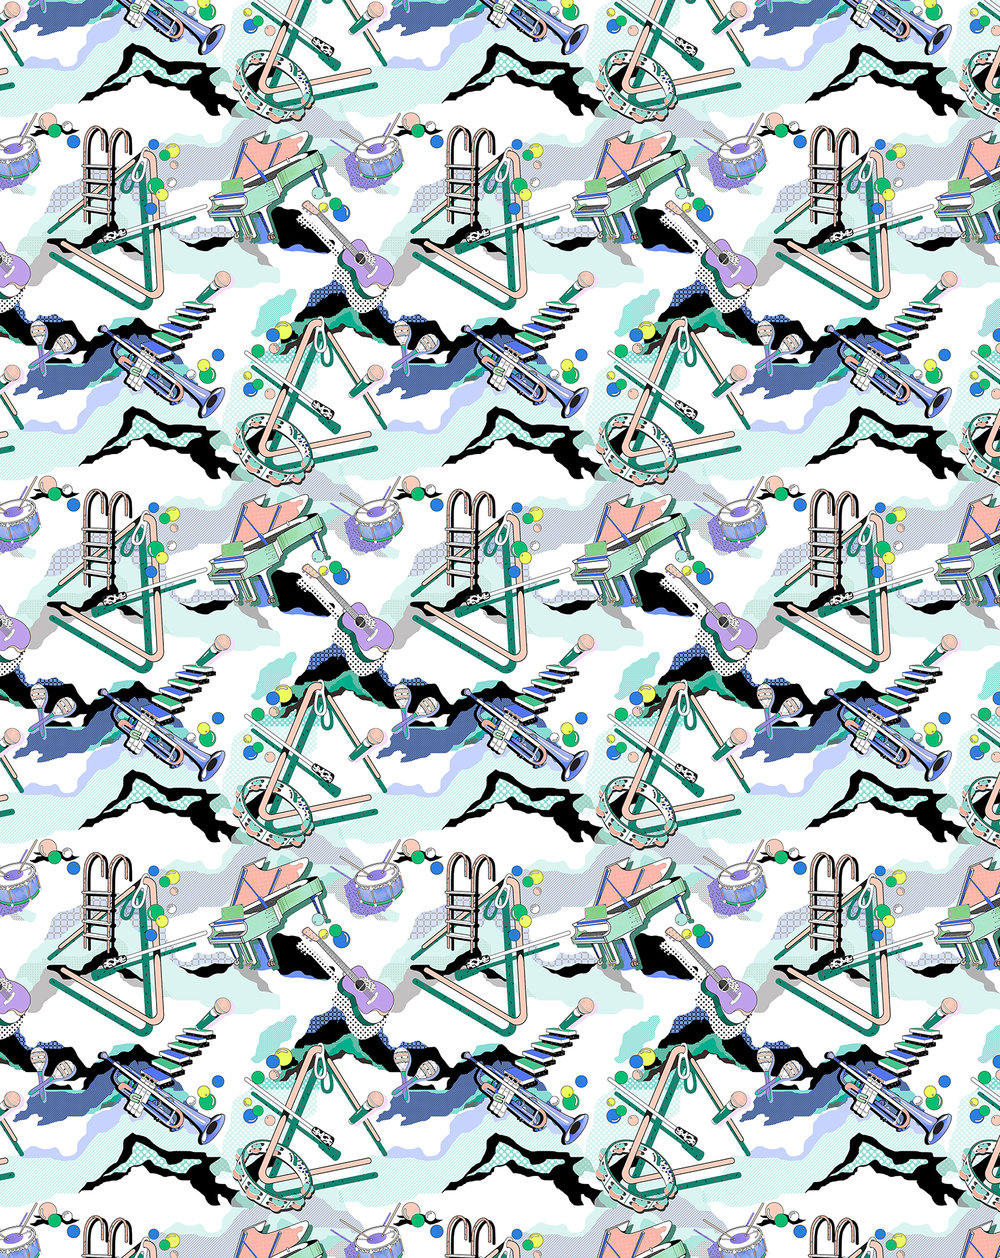 PommeChan_Pattern_Music1_Lowres_15x15.jpg